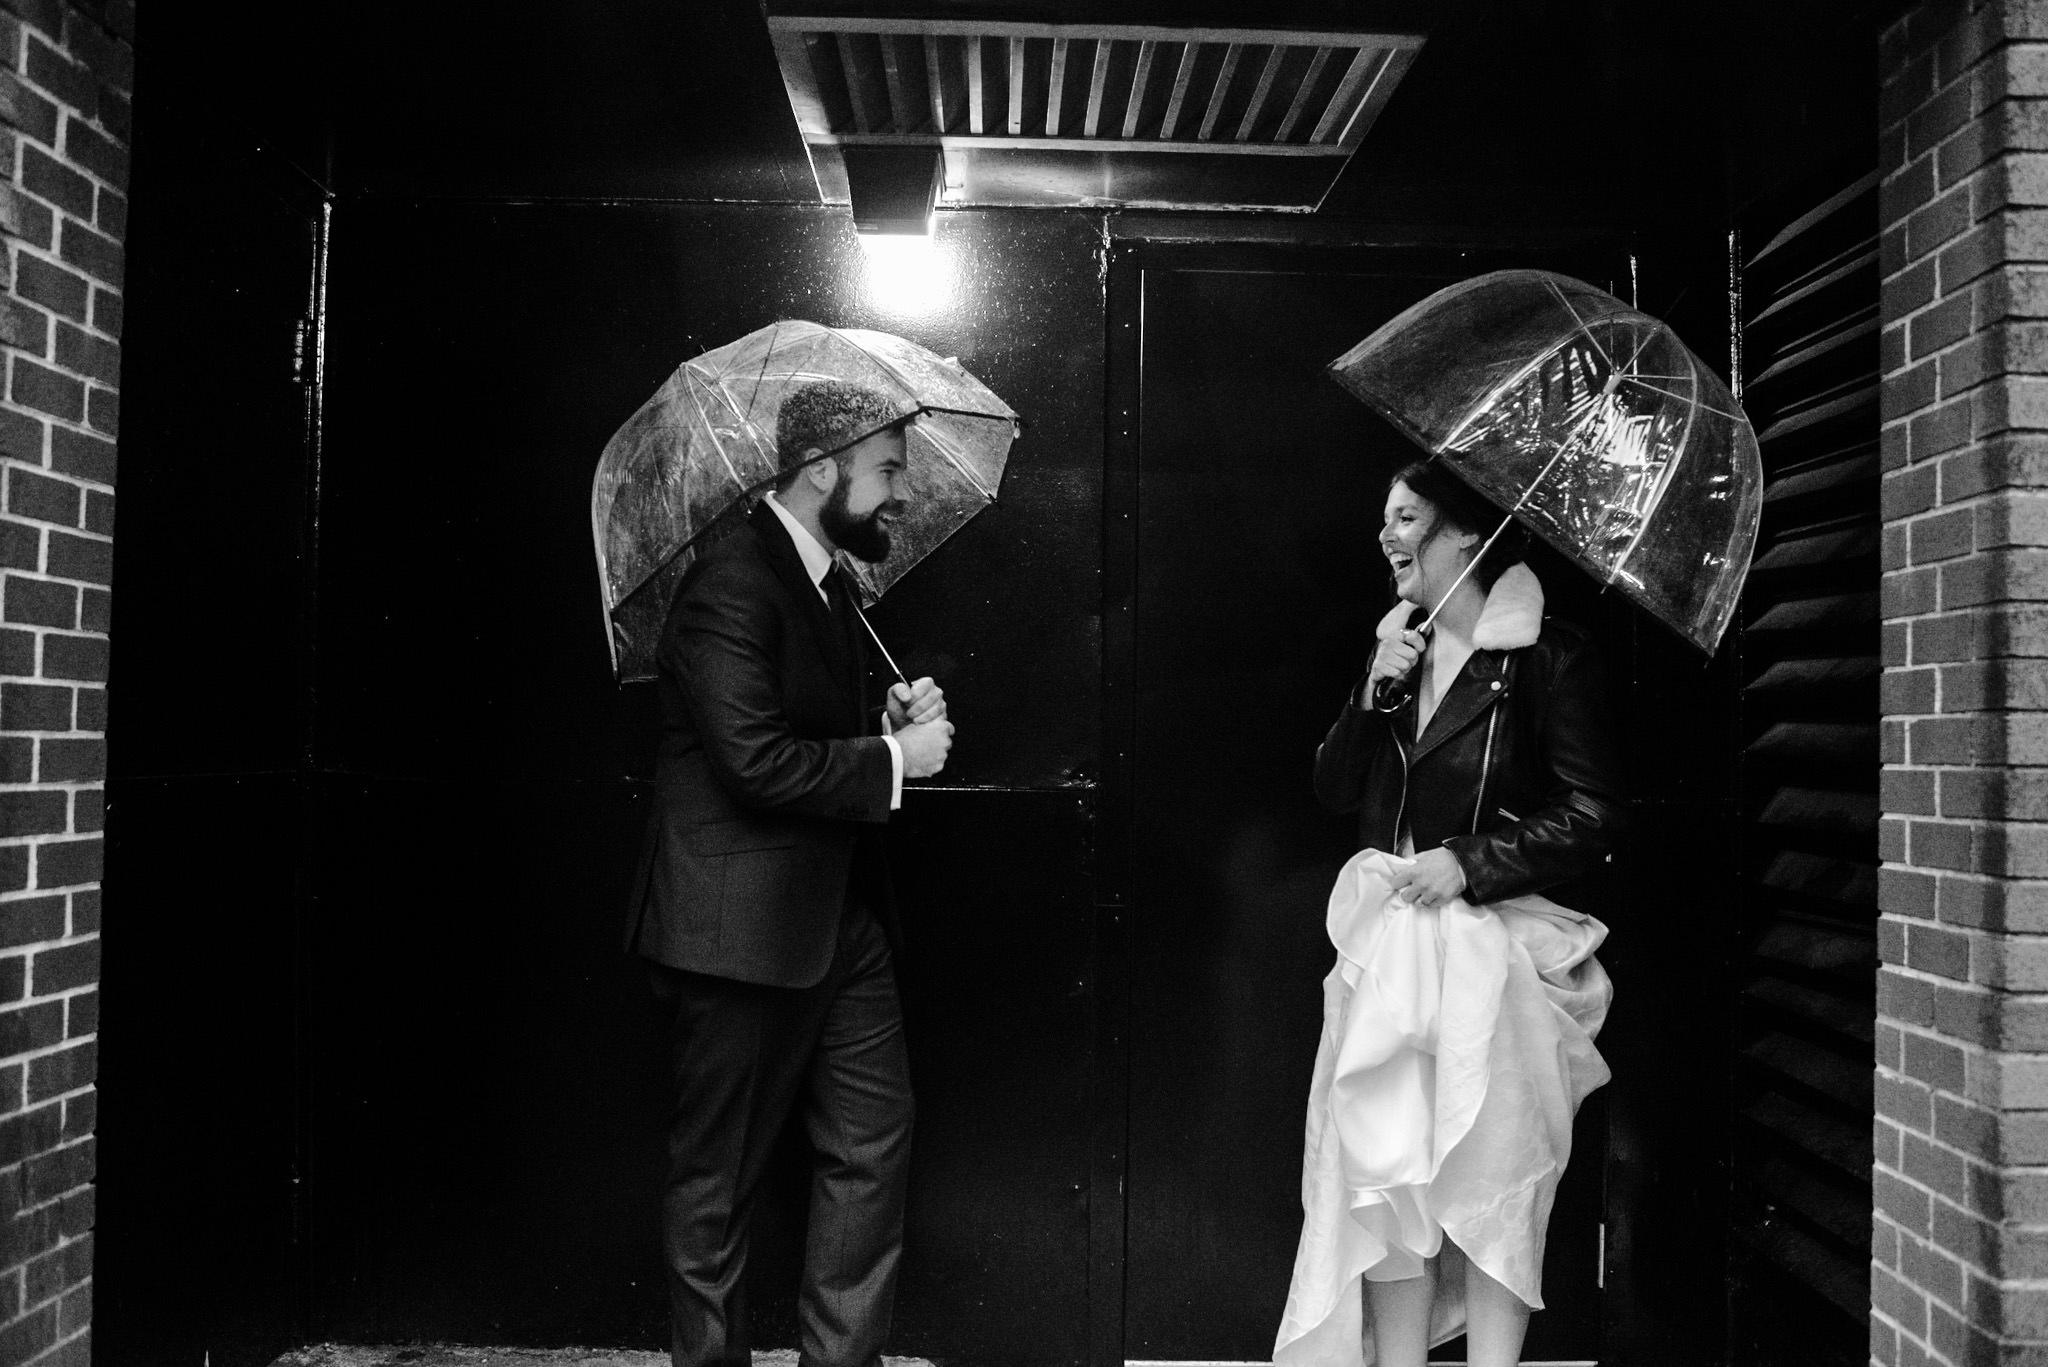 127-rainy-day-wedding-toronto-wedding-photographer-clear-umbrellas.jpg